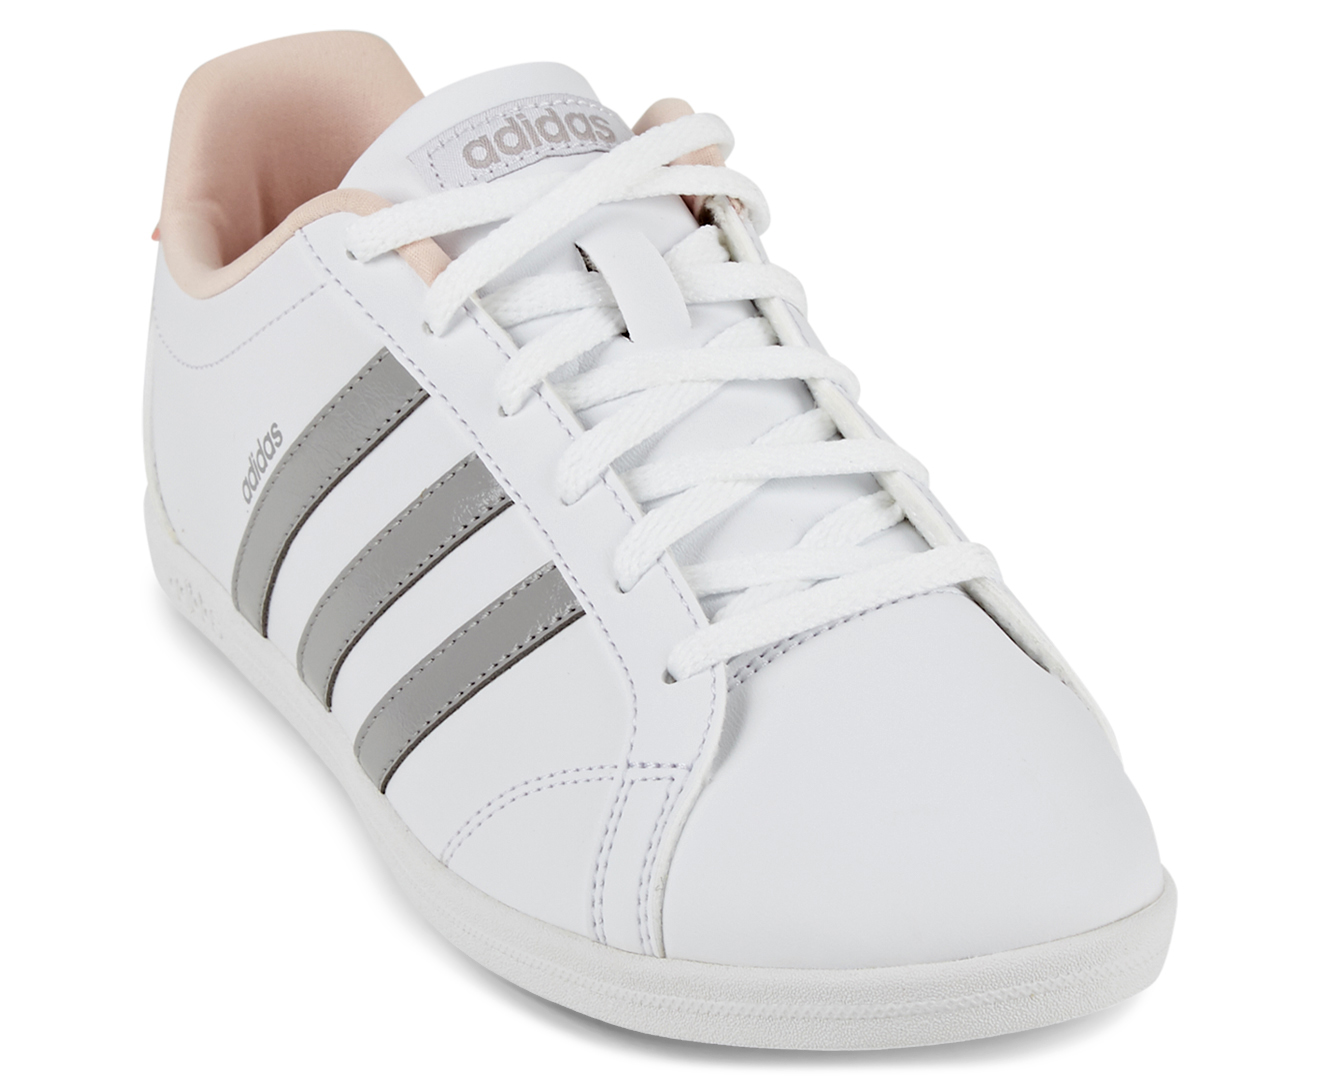 Adidas NEO Women's VS Coneo QT Shoe WhiteGrey